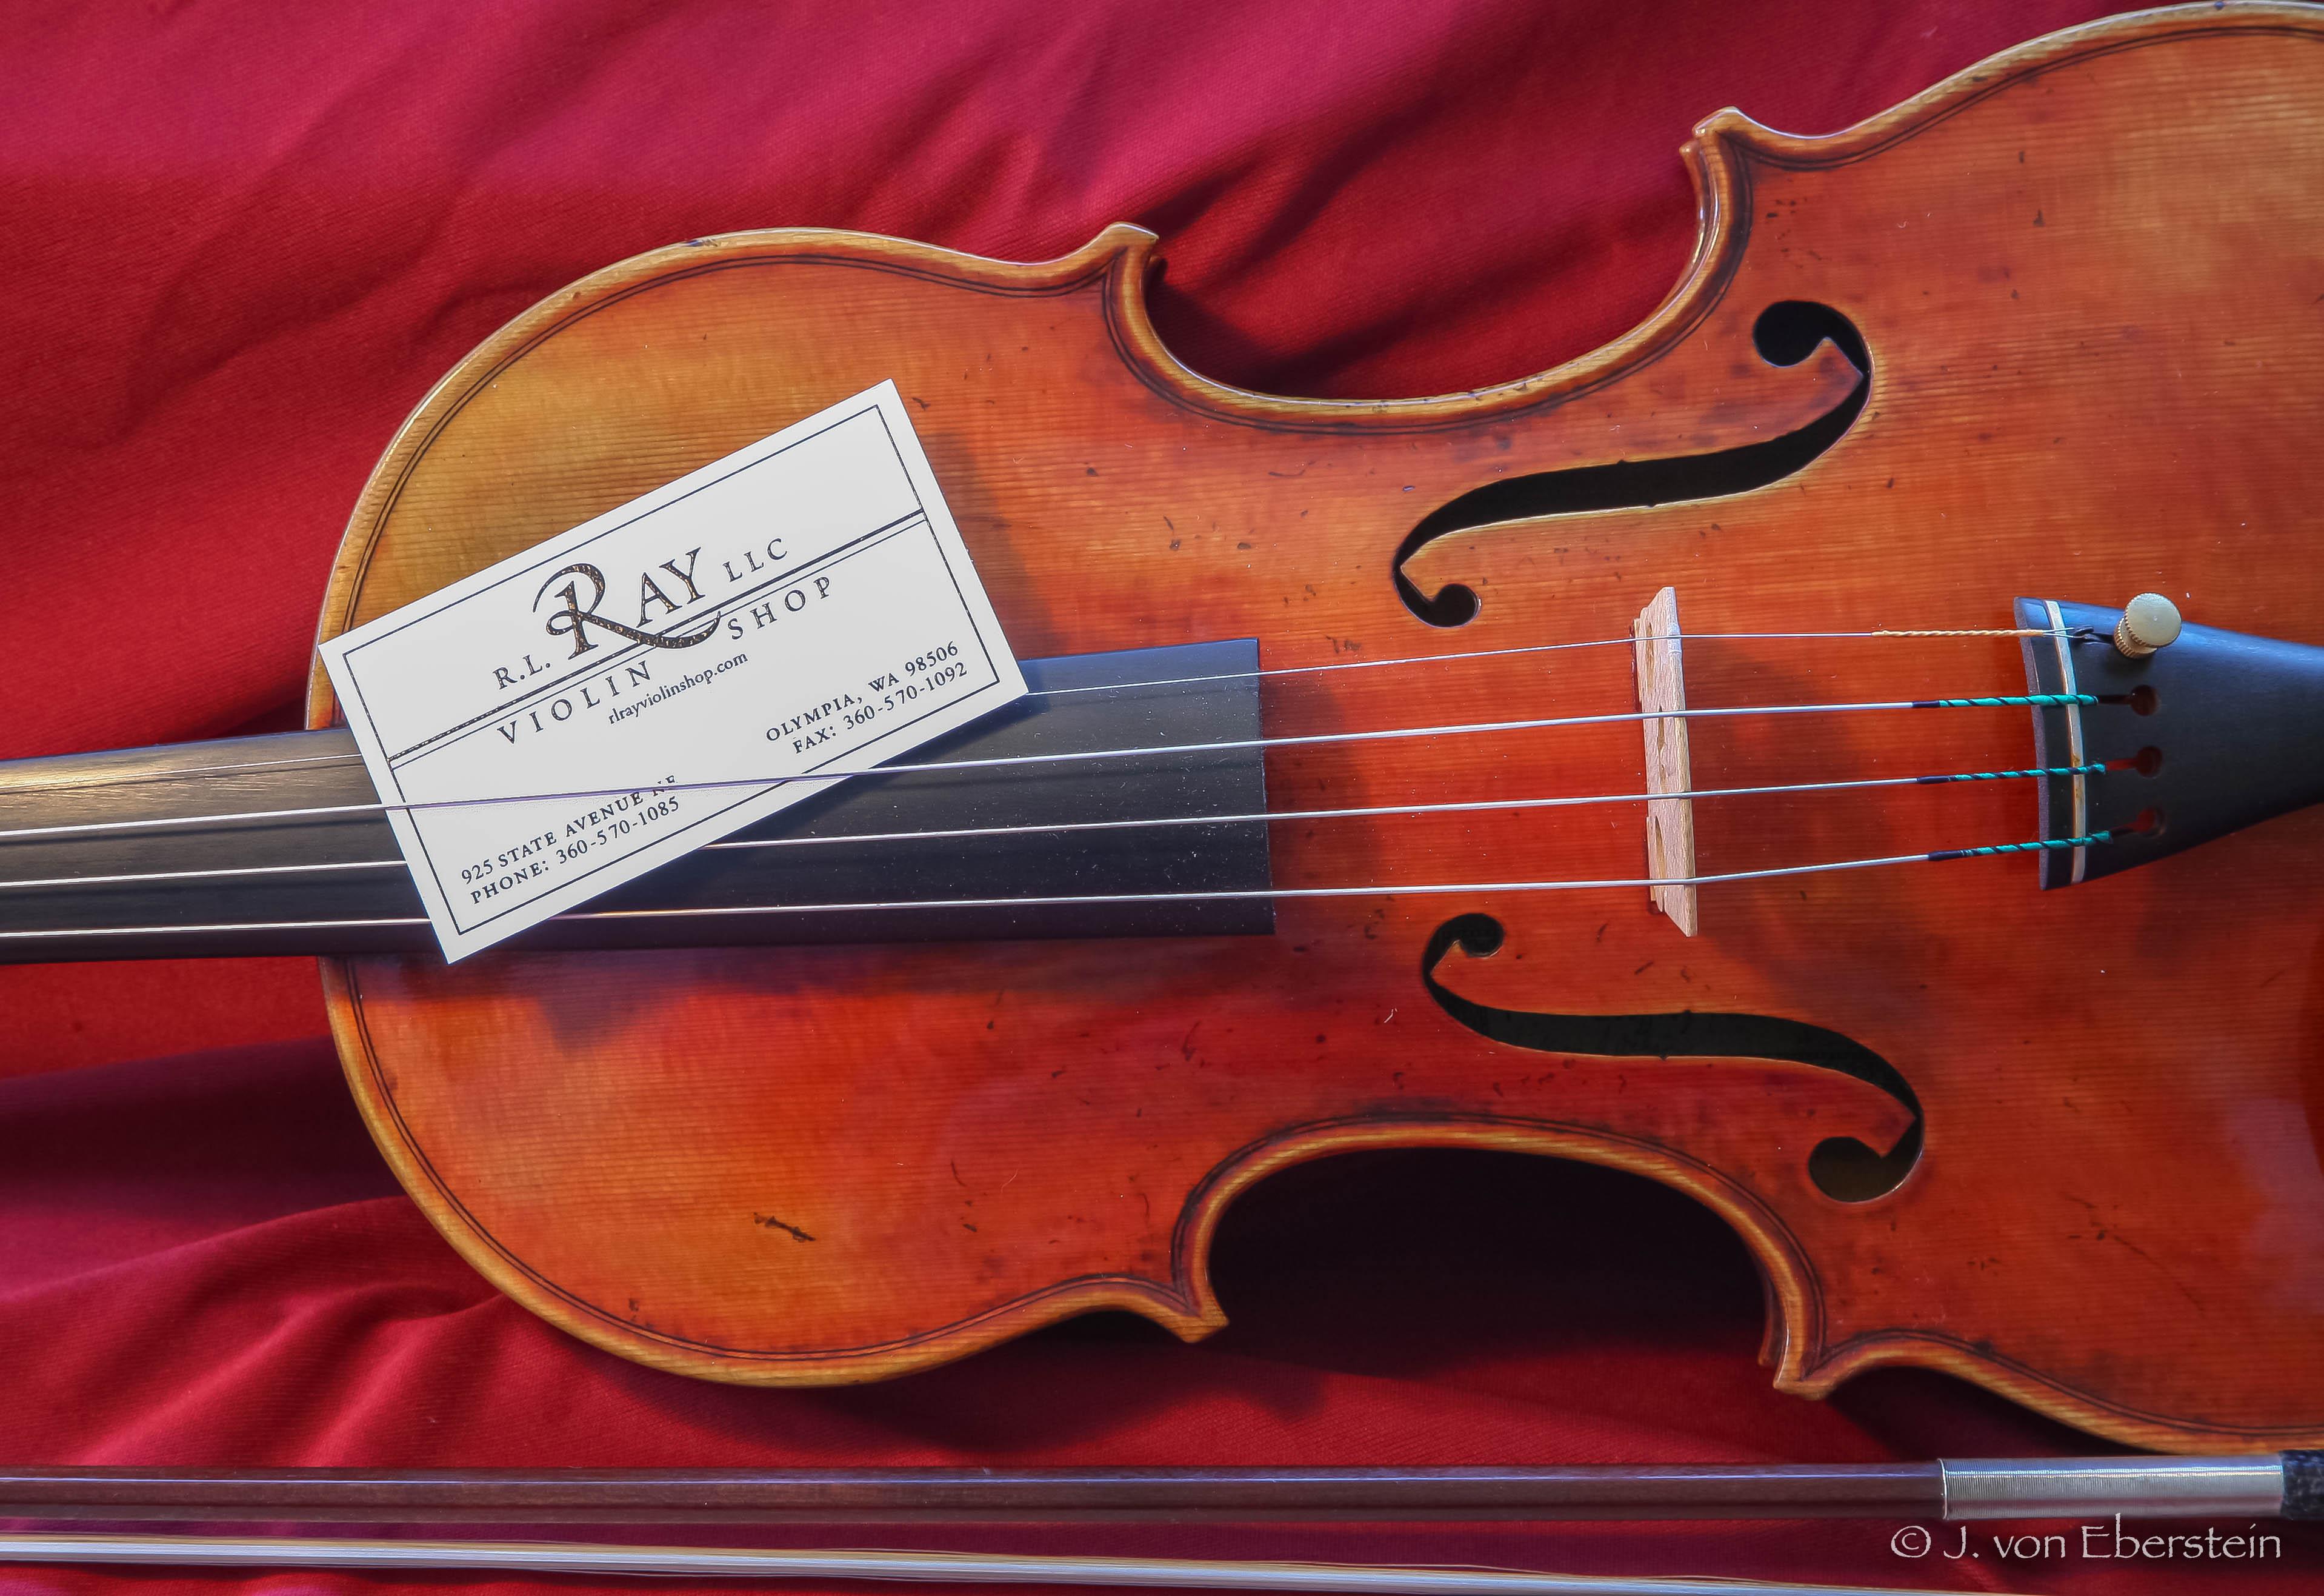 R. L. Ray Violin Shop, Olympia, WA